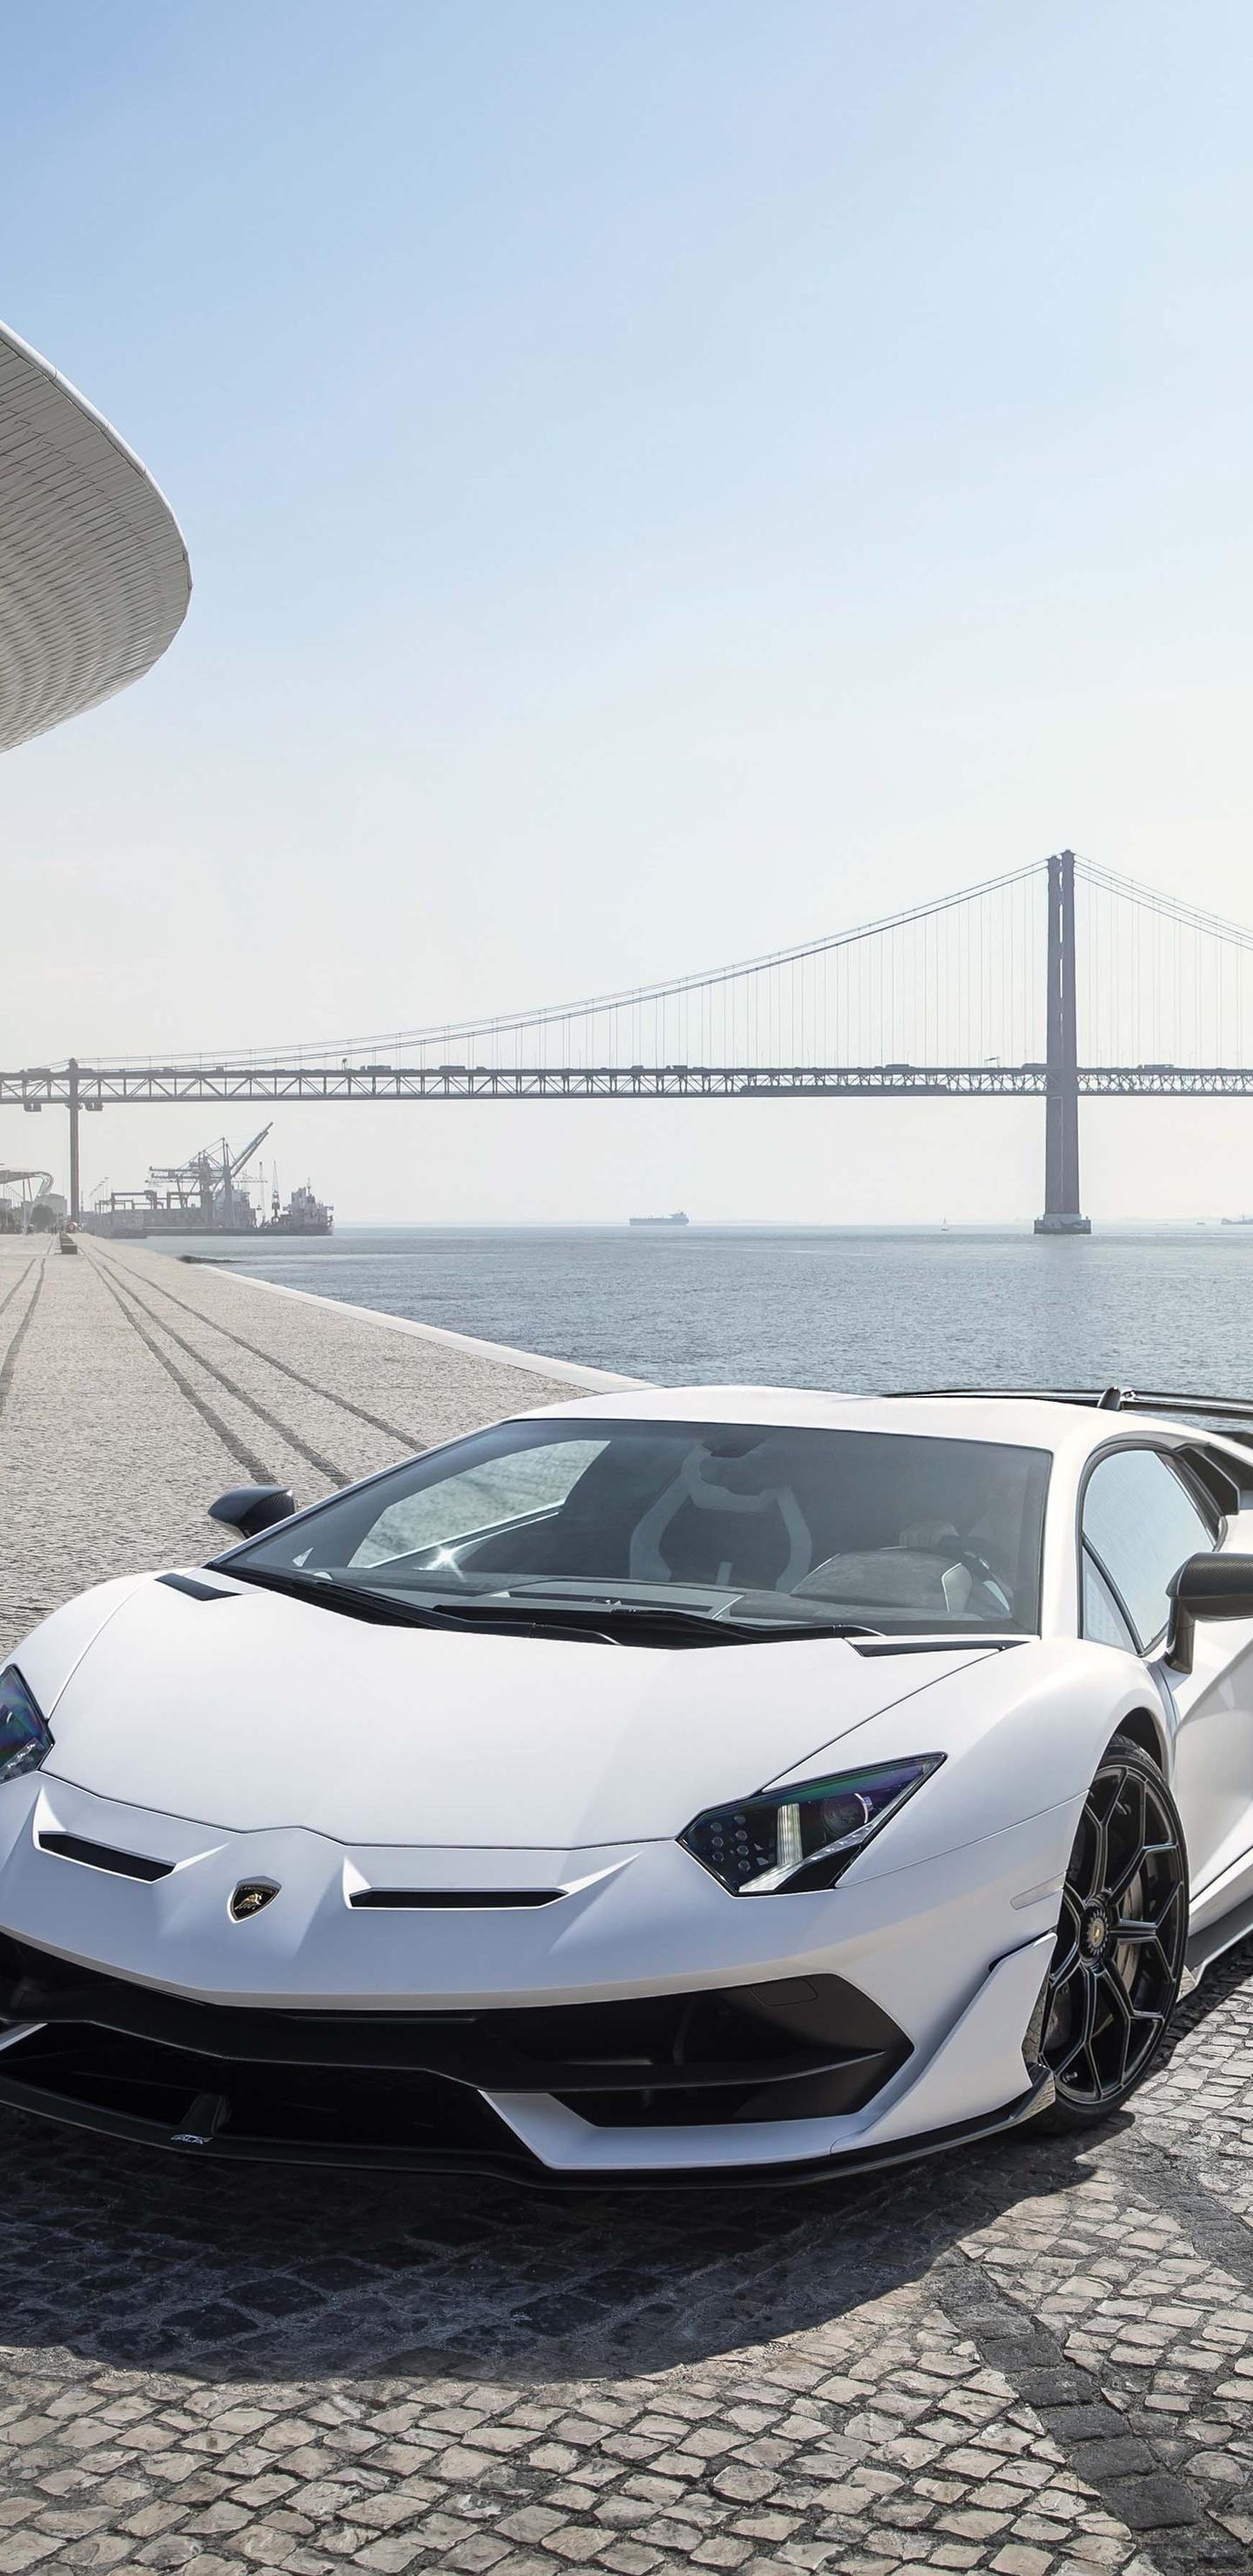 1440x2960 Lamborghini Aventador Svj White Lisbon 5k Samsung Galaxy